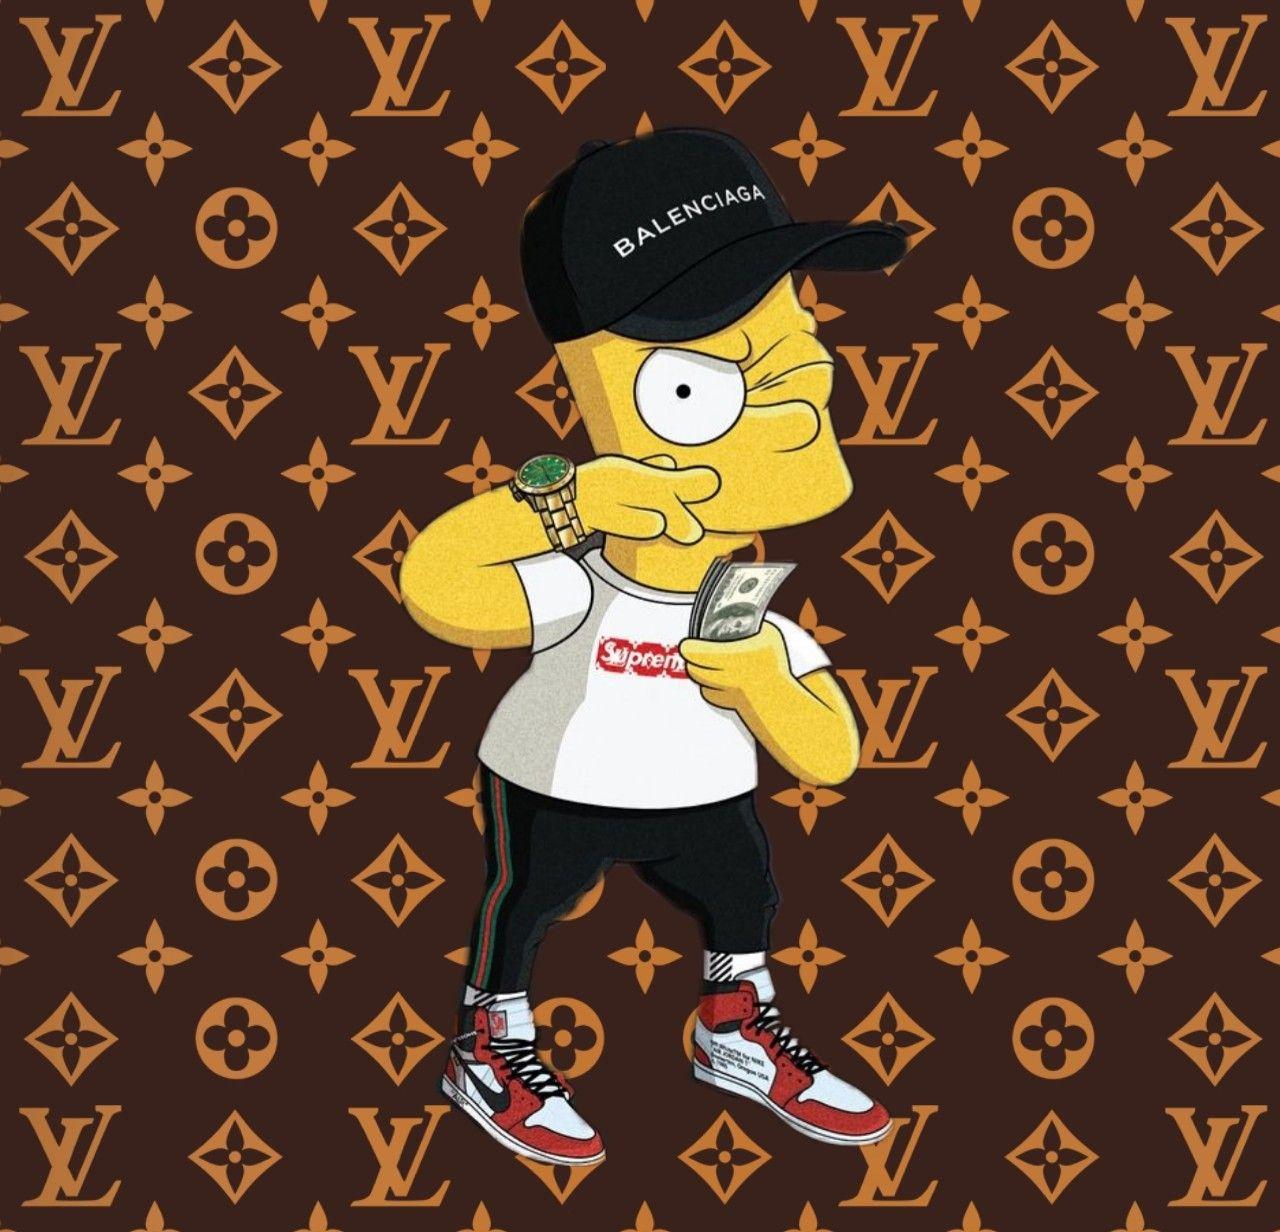 Bartsimpson Thesimpsons Hypebeast Supreme Louisvuitton Rolex Nike Bart Simpson Art Simpsons Art Cartoon Wallpaper